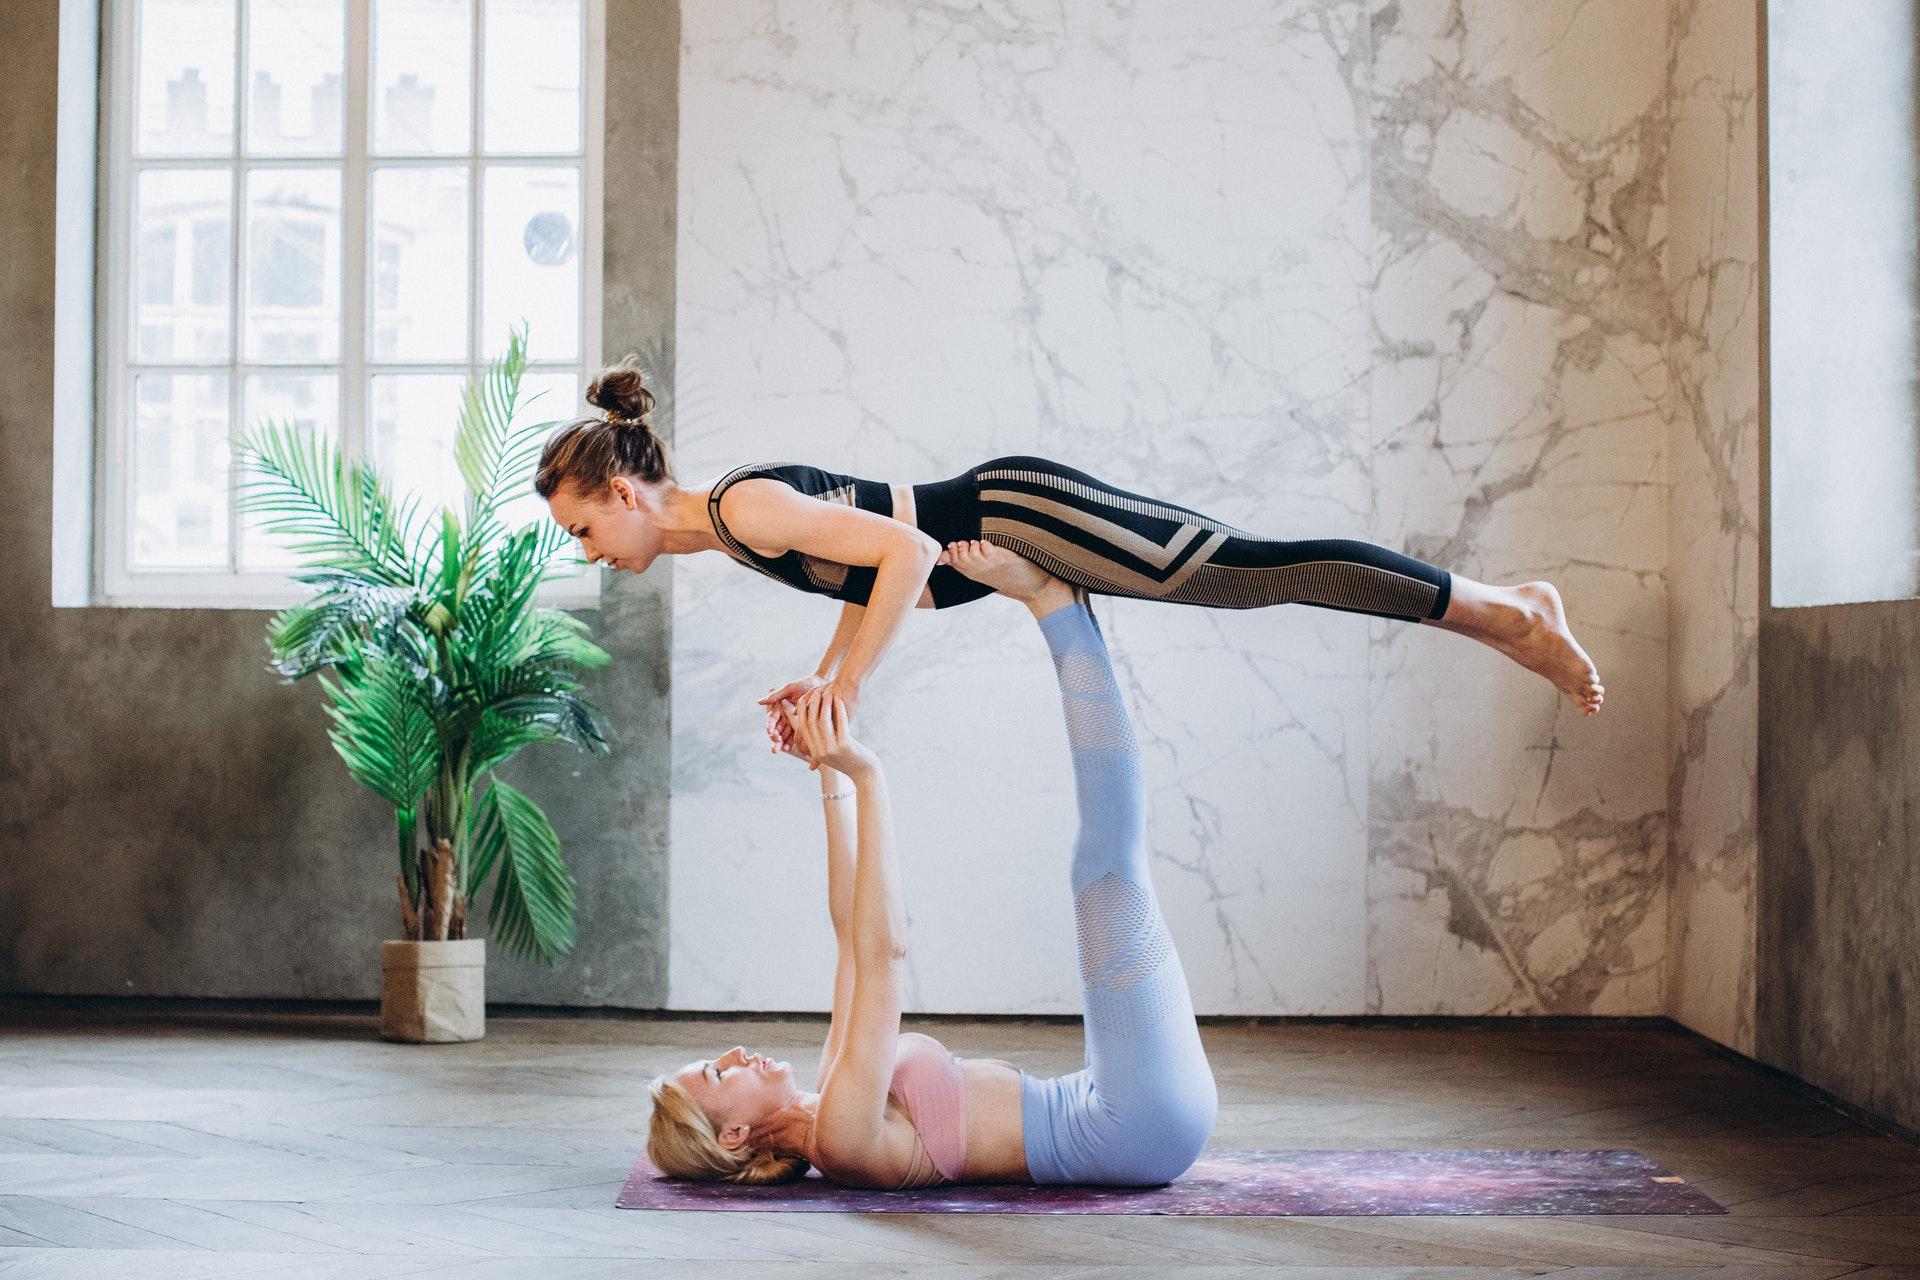 zwei frauen in sportbekleidung machen acro yoga